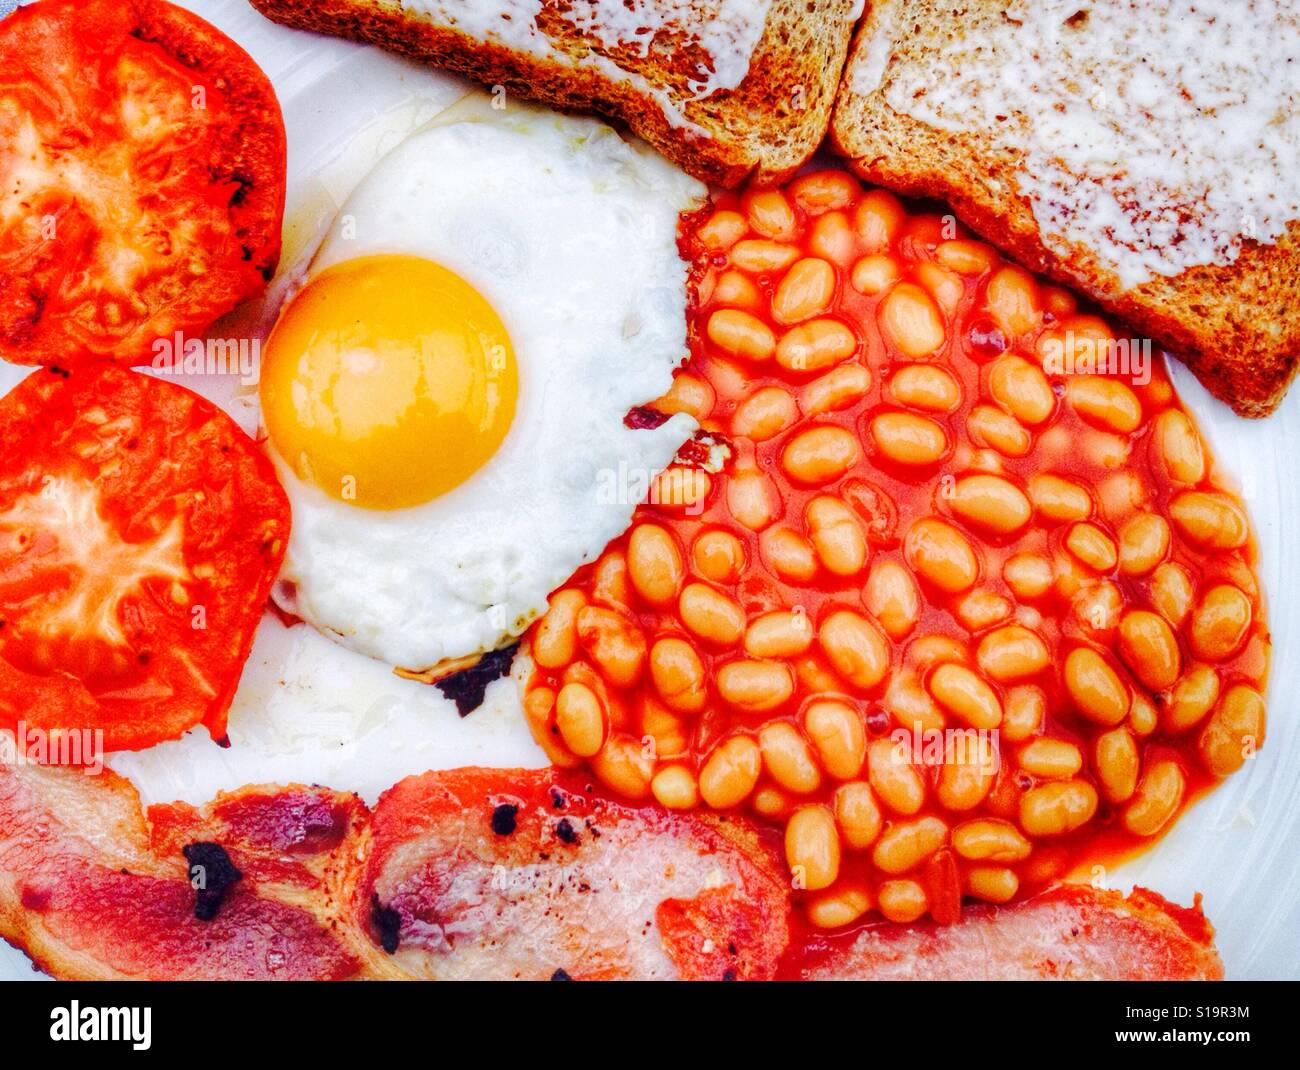 Fried English breakfast - Stock Image